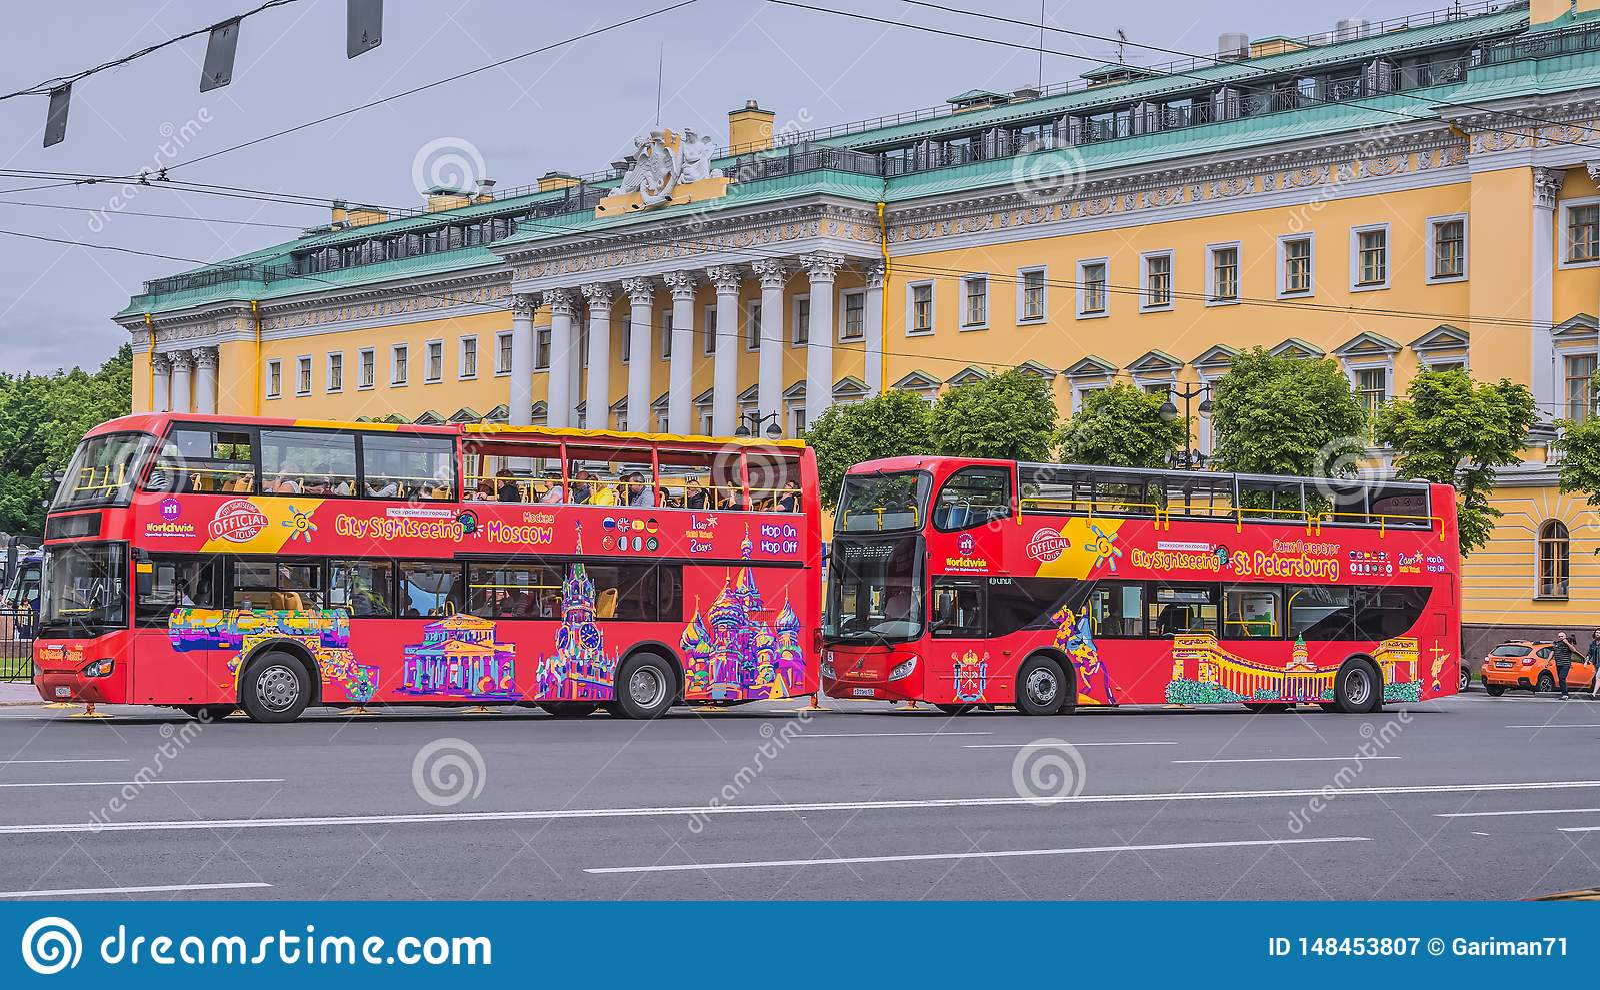 City sketches Saint-Petersburg, Russia